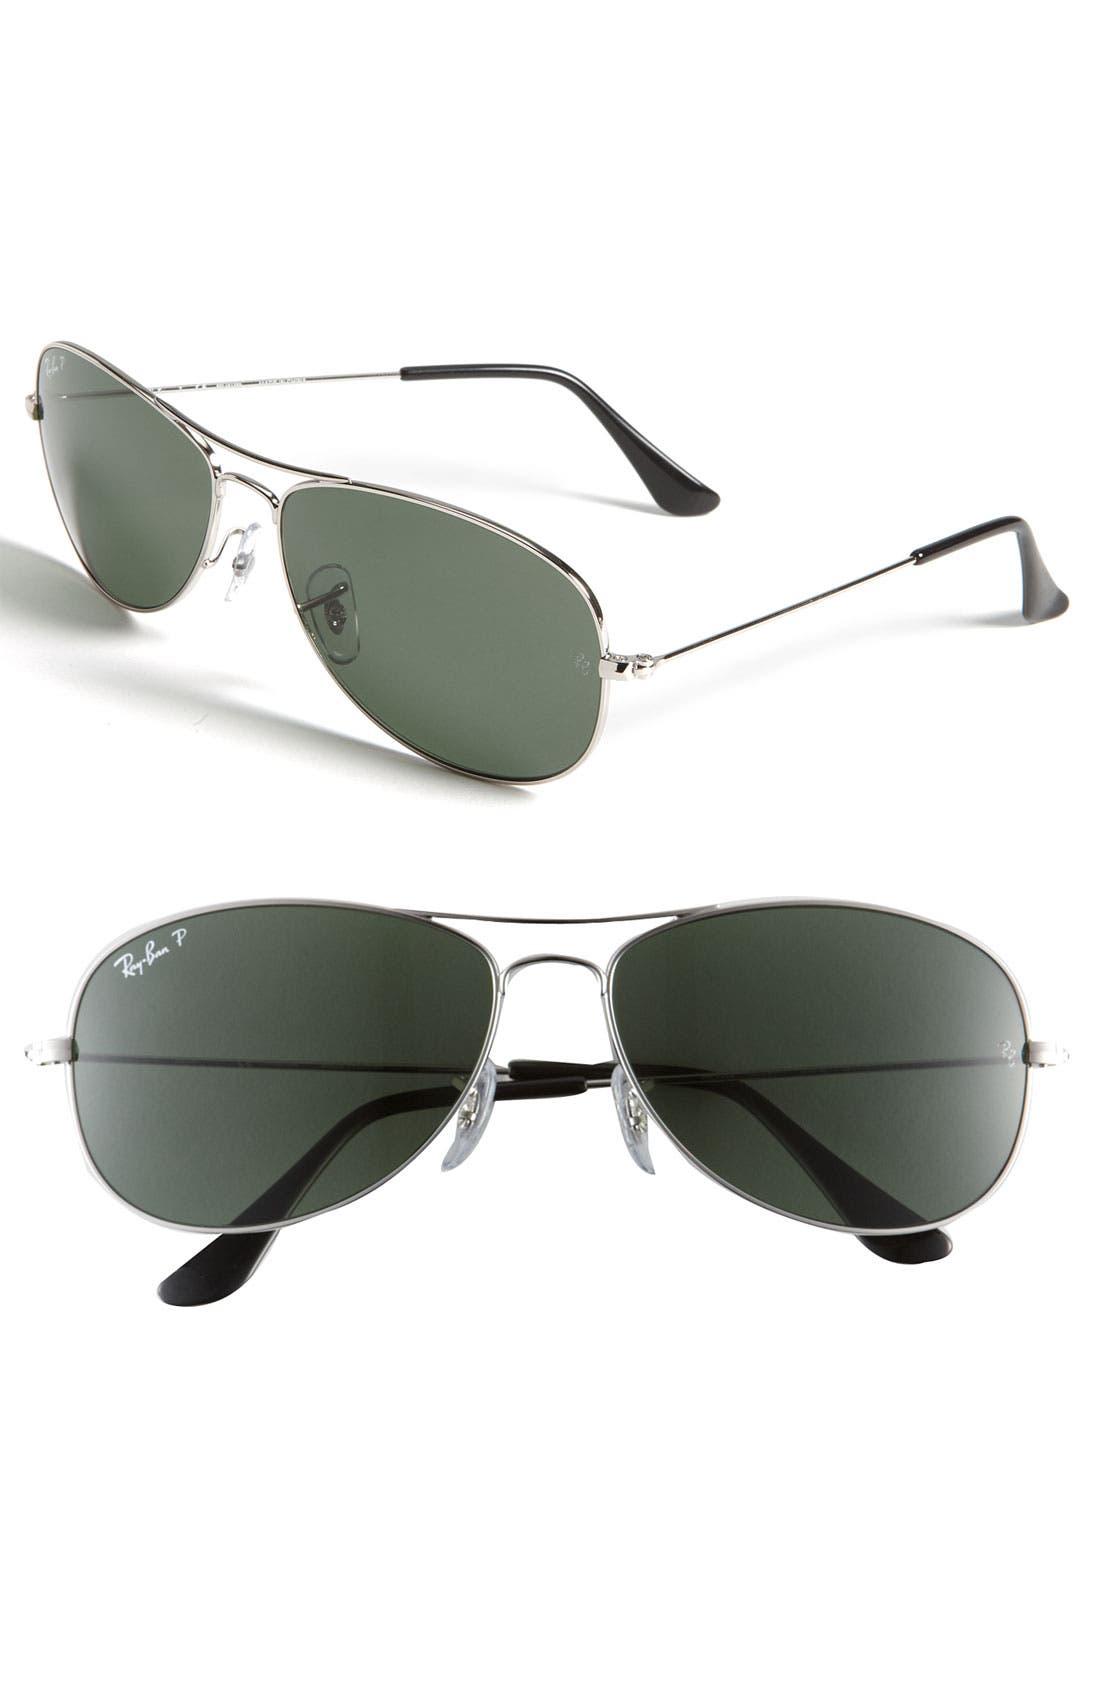 Main Image - Ray-Ban 'New Classic Aviator' 59mm Polarized Sunglasses